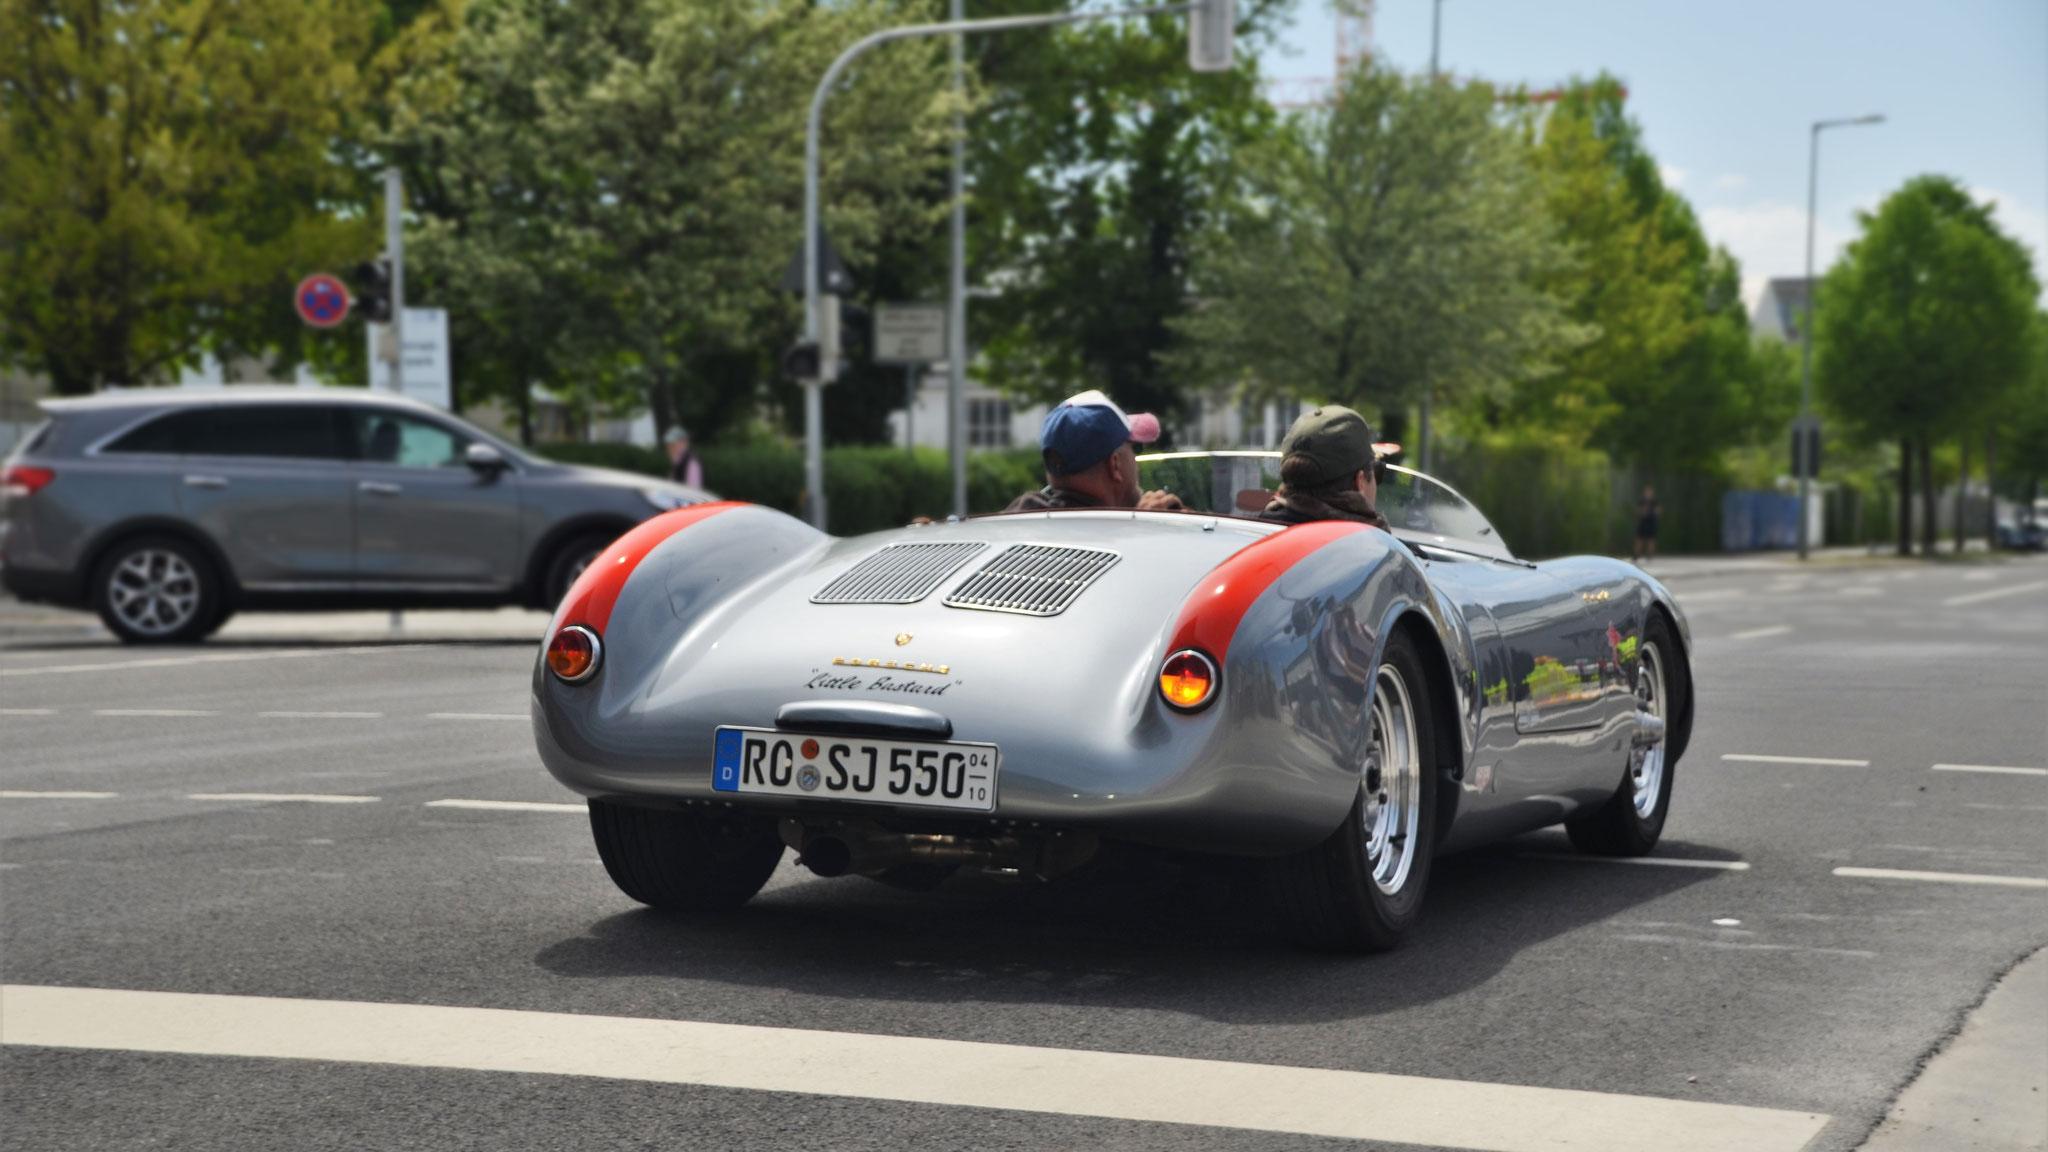 Porsche 550 Spyder - RO-SJ-550